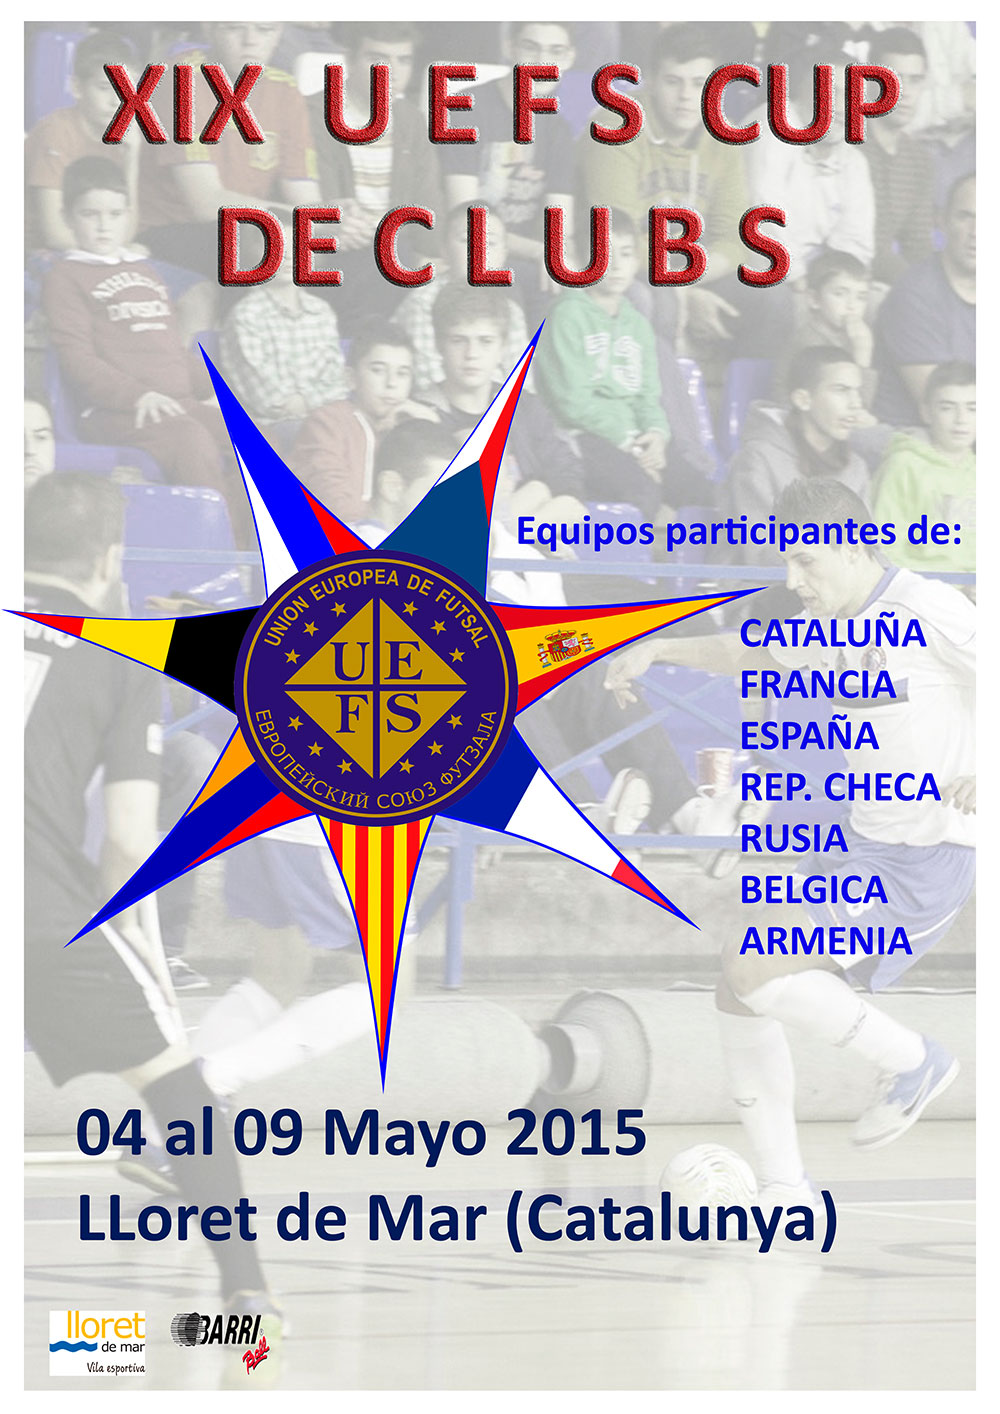 2015-03-27-affiche-uefs-cup-2015